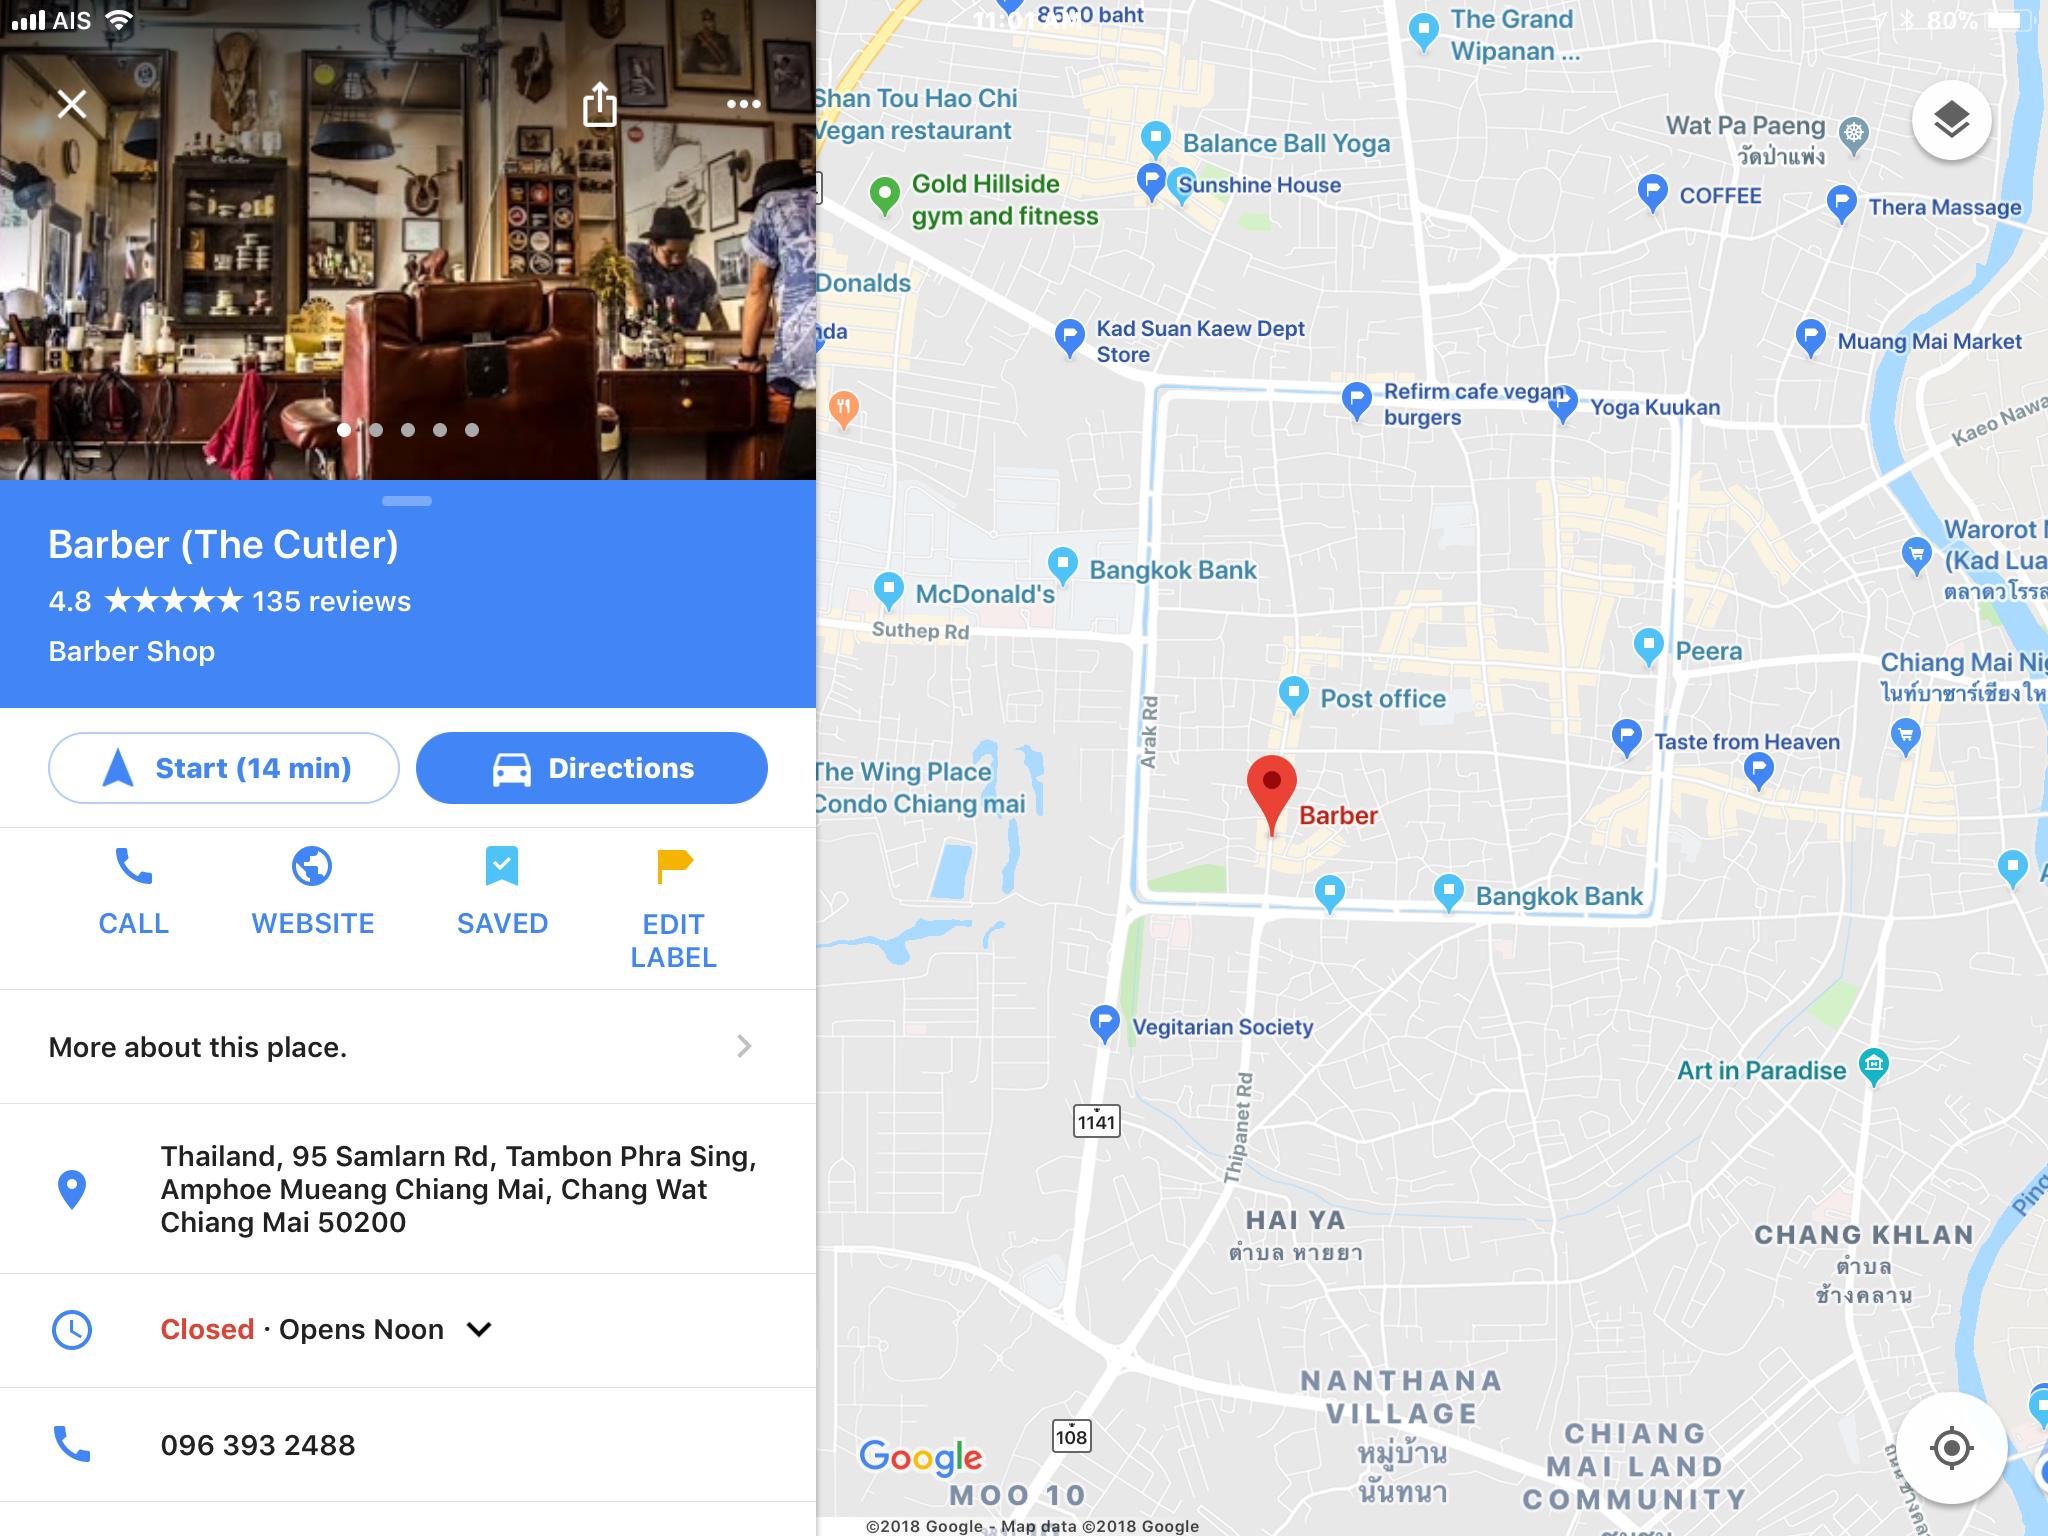 Best Men's Barber in Chiang Mai? - Chiang Mai Forum - Thailand Visa